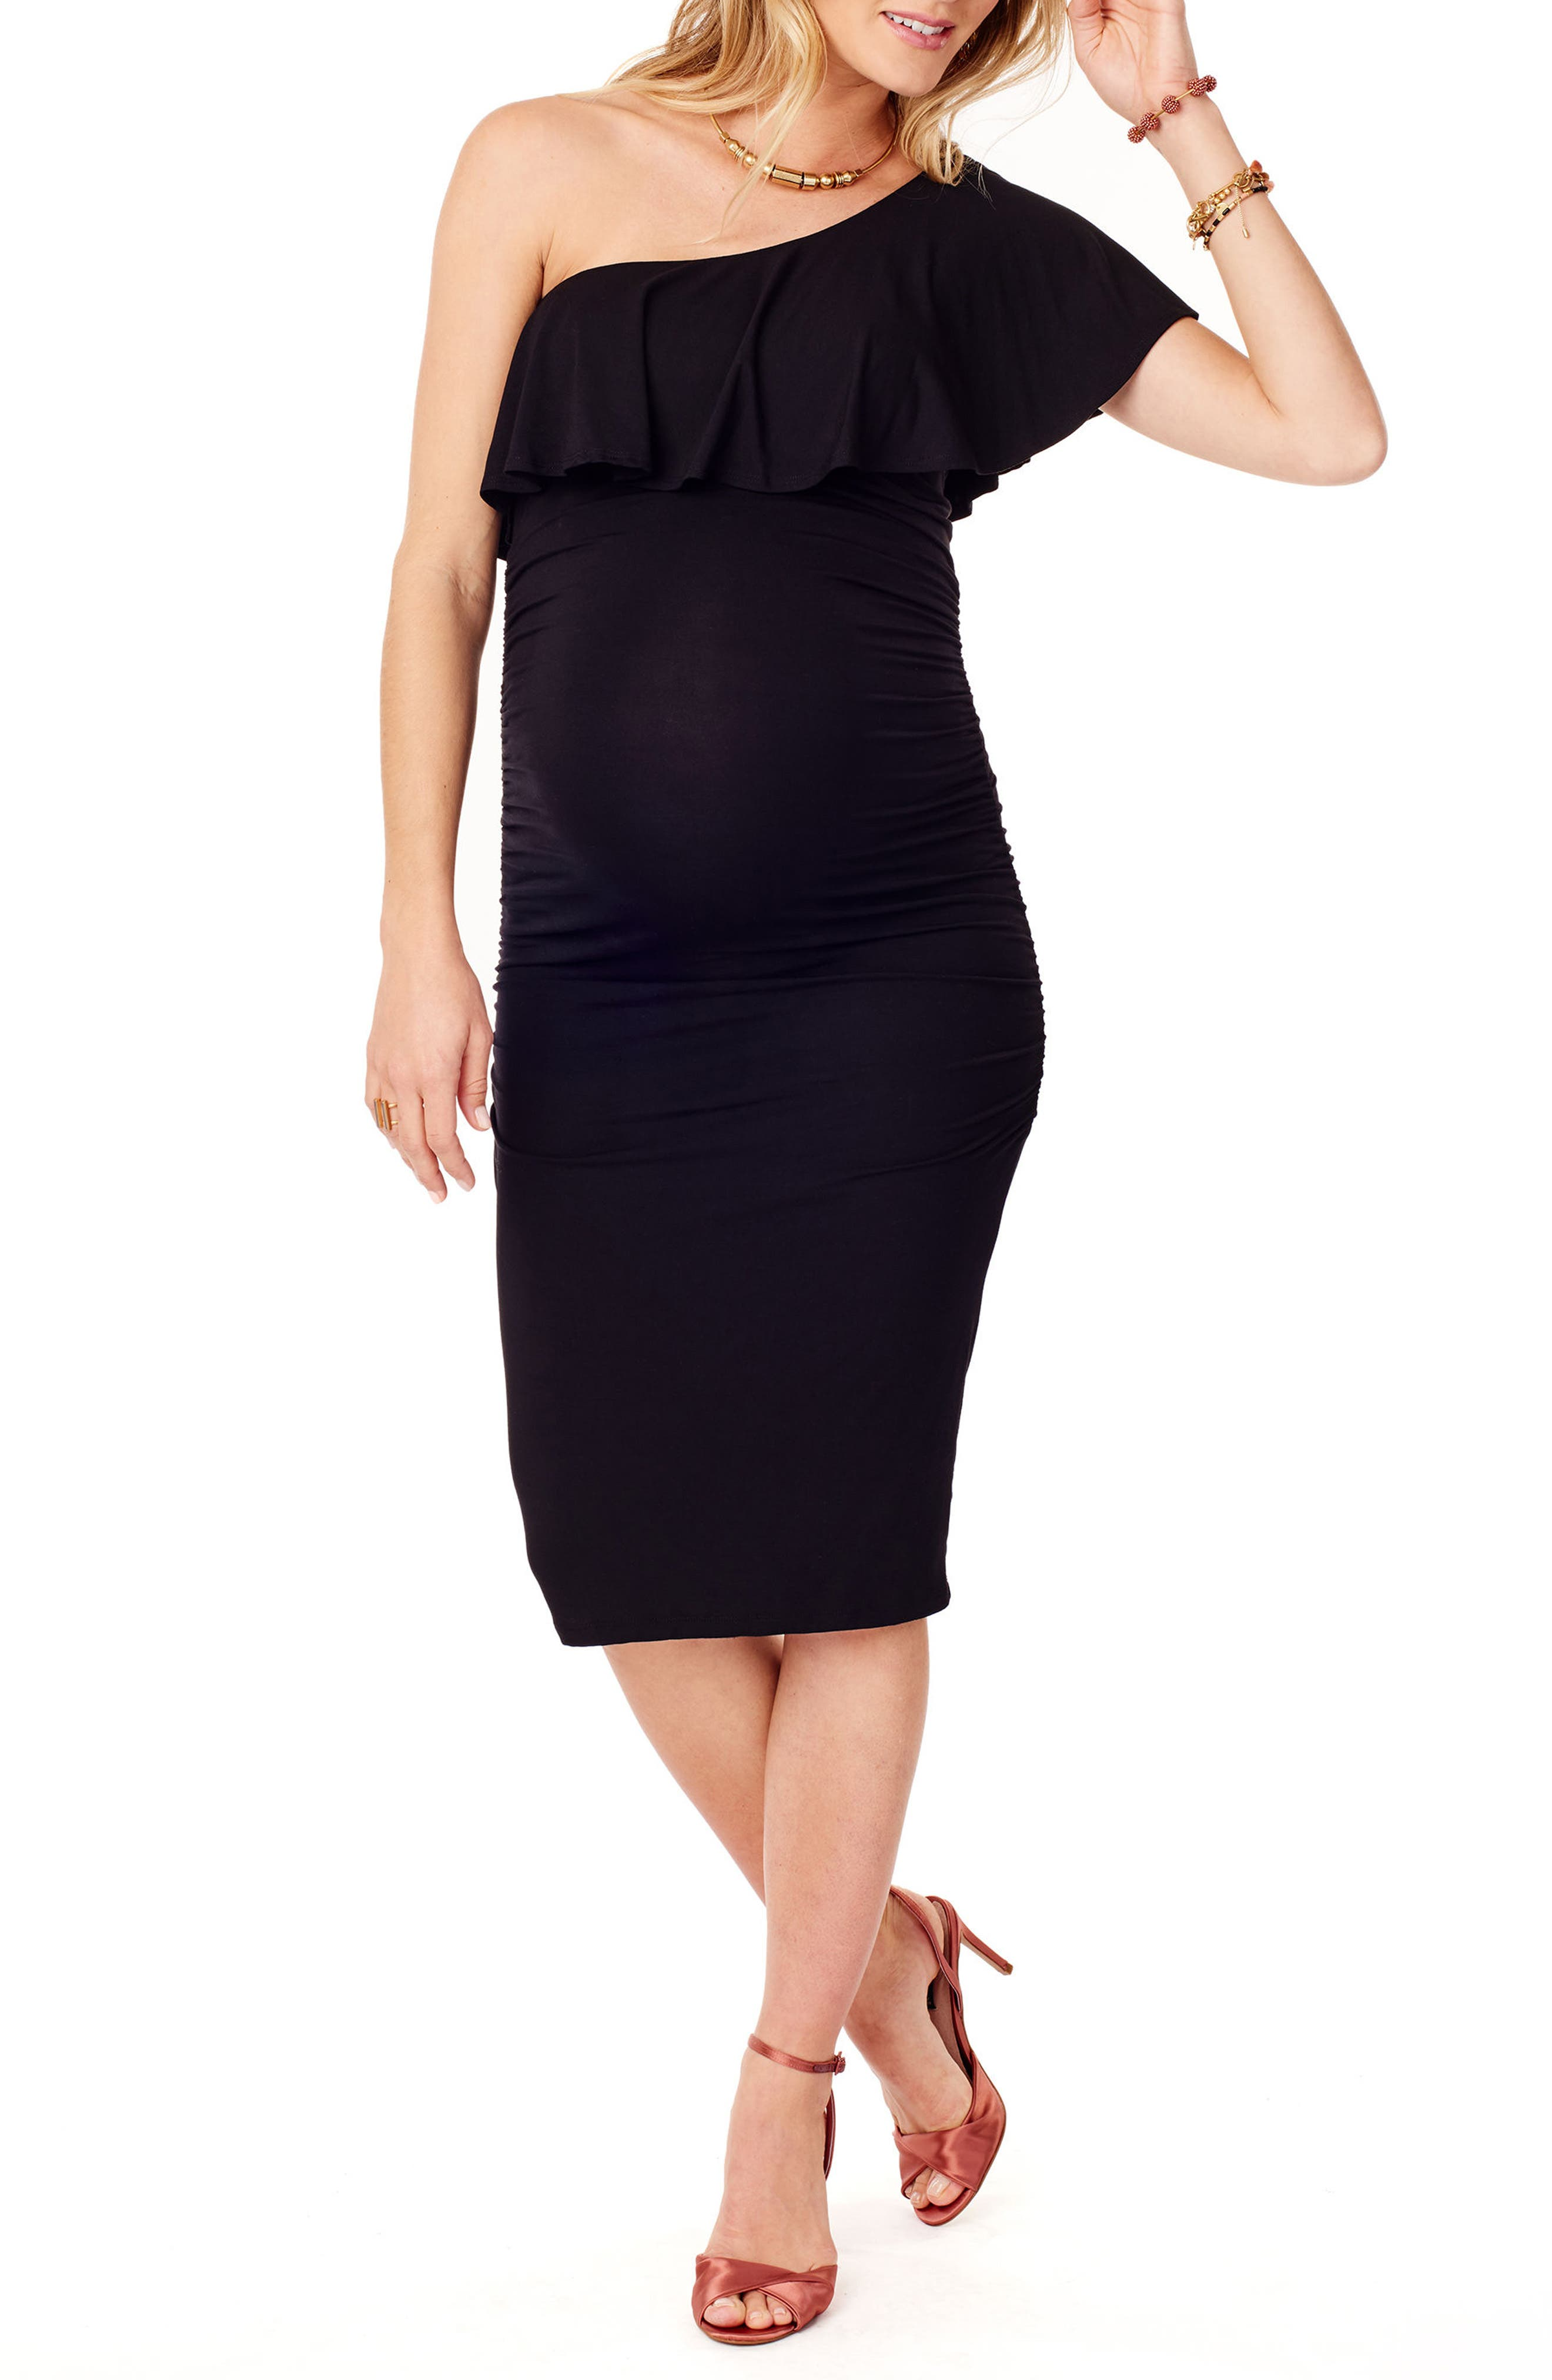 Ruffle One-Shoulder Maternity Dress,                             Main thumbnail 1, color,                             Jet Black